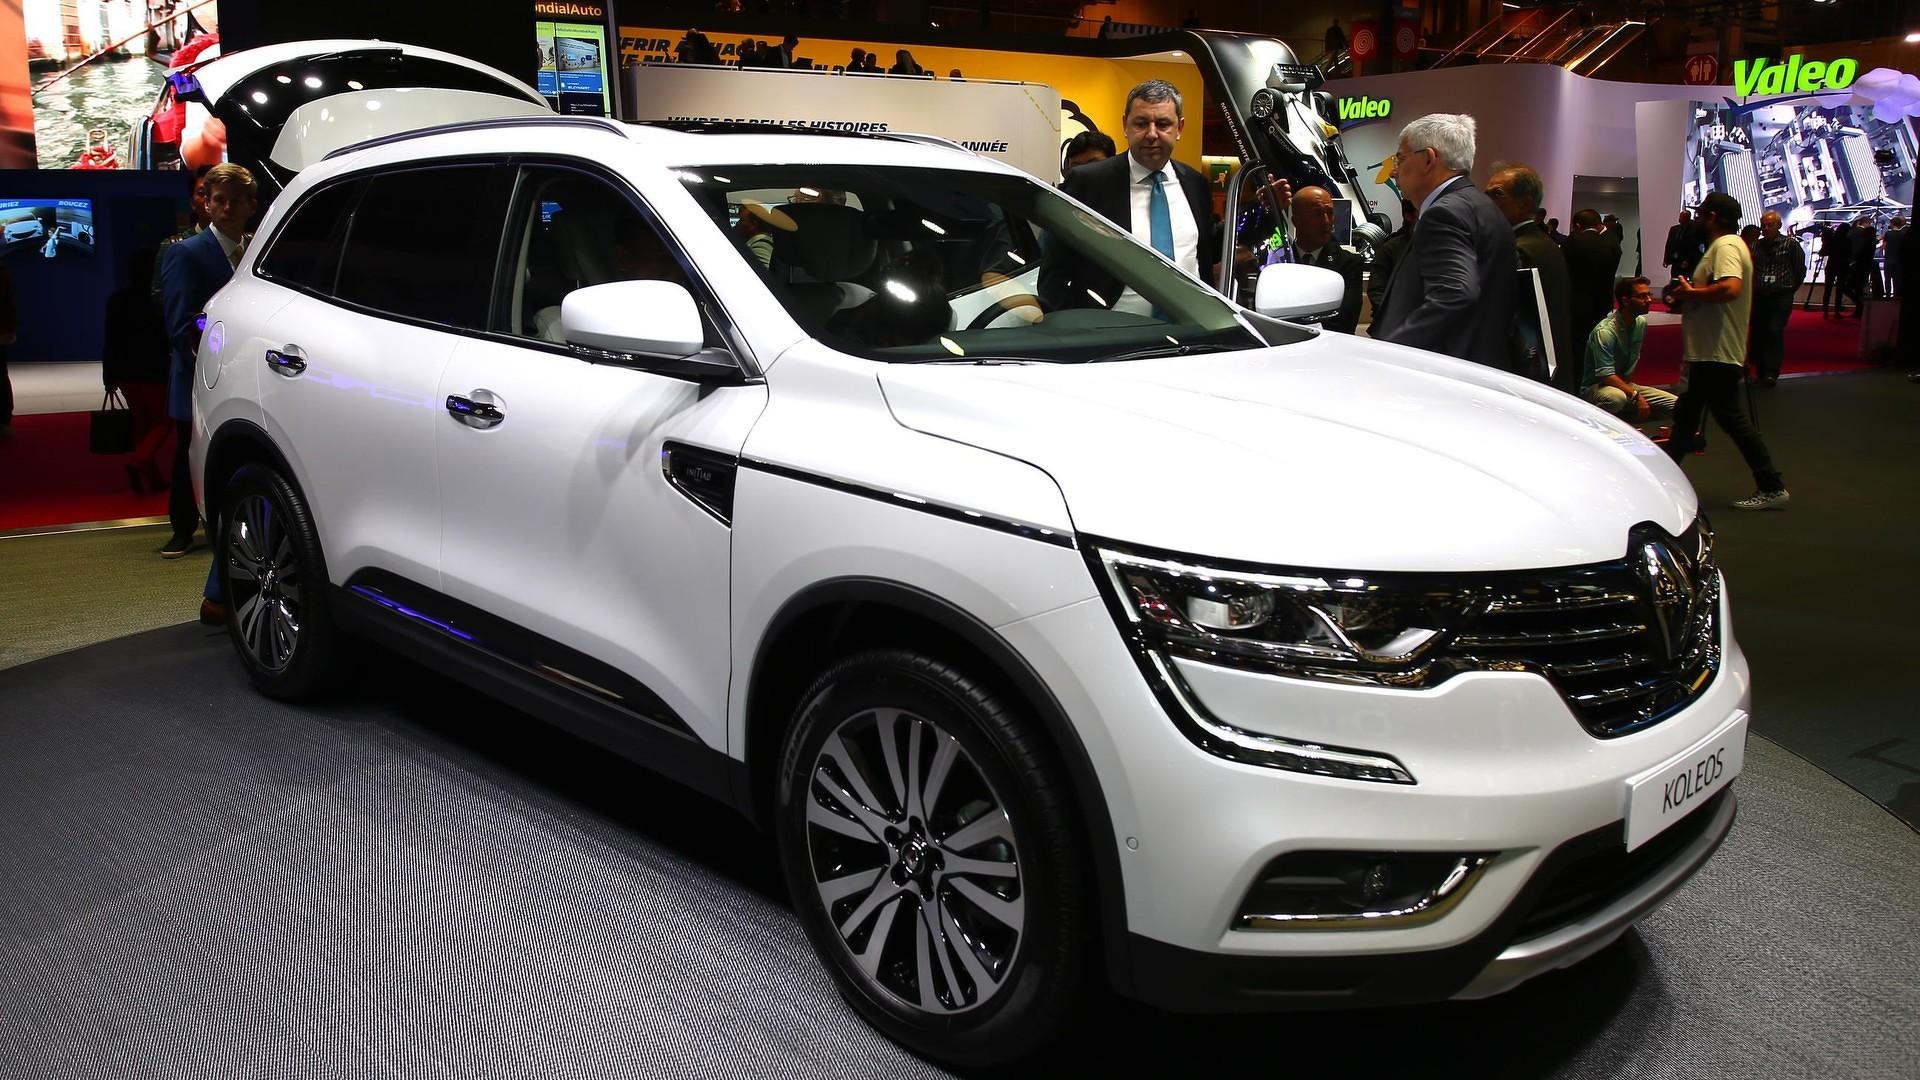 Renault suv 2018